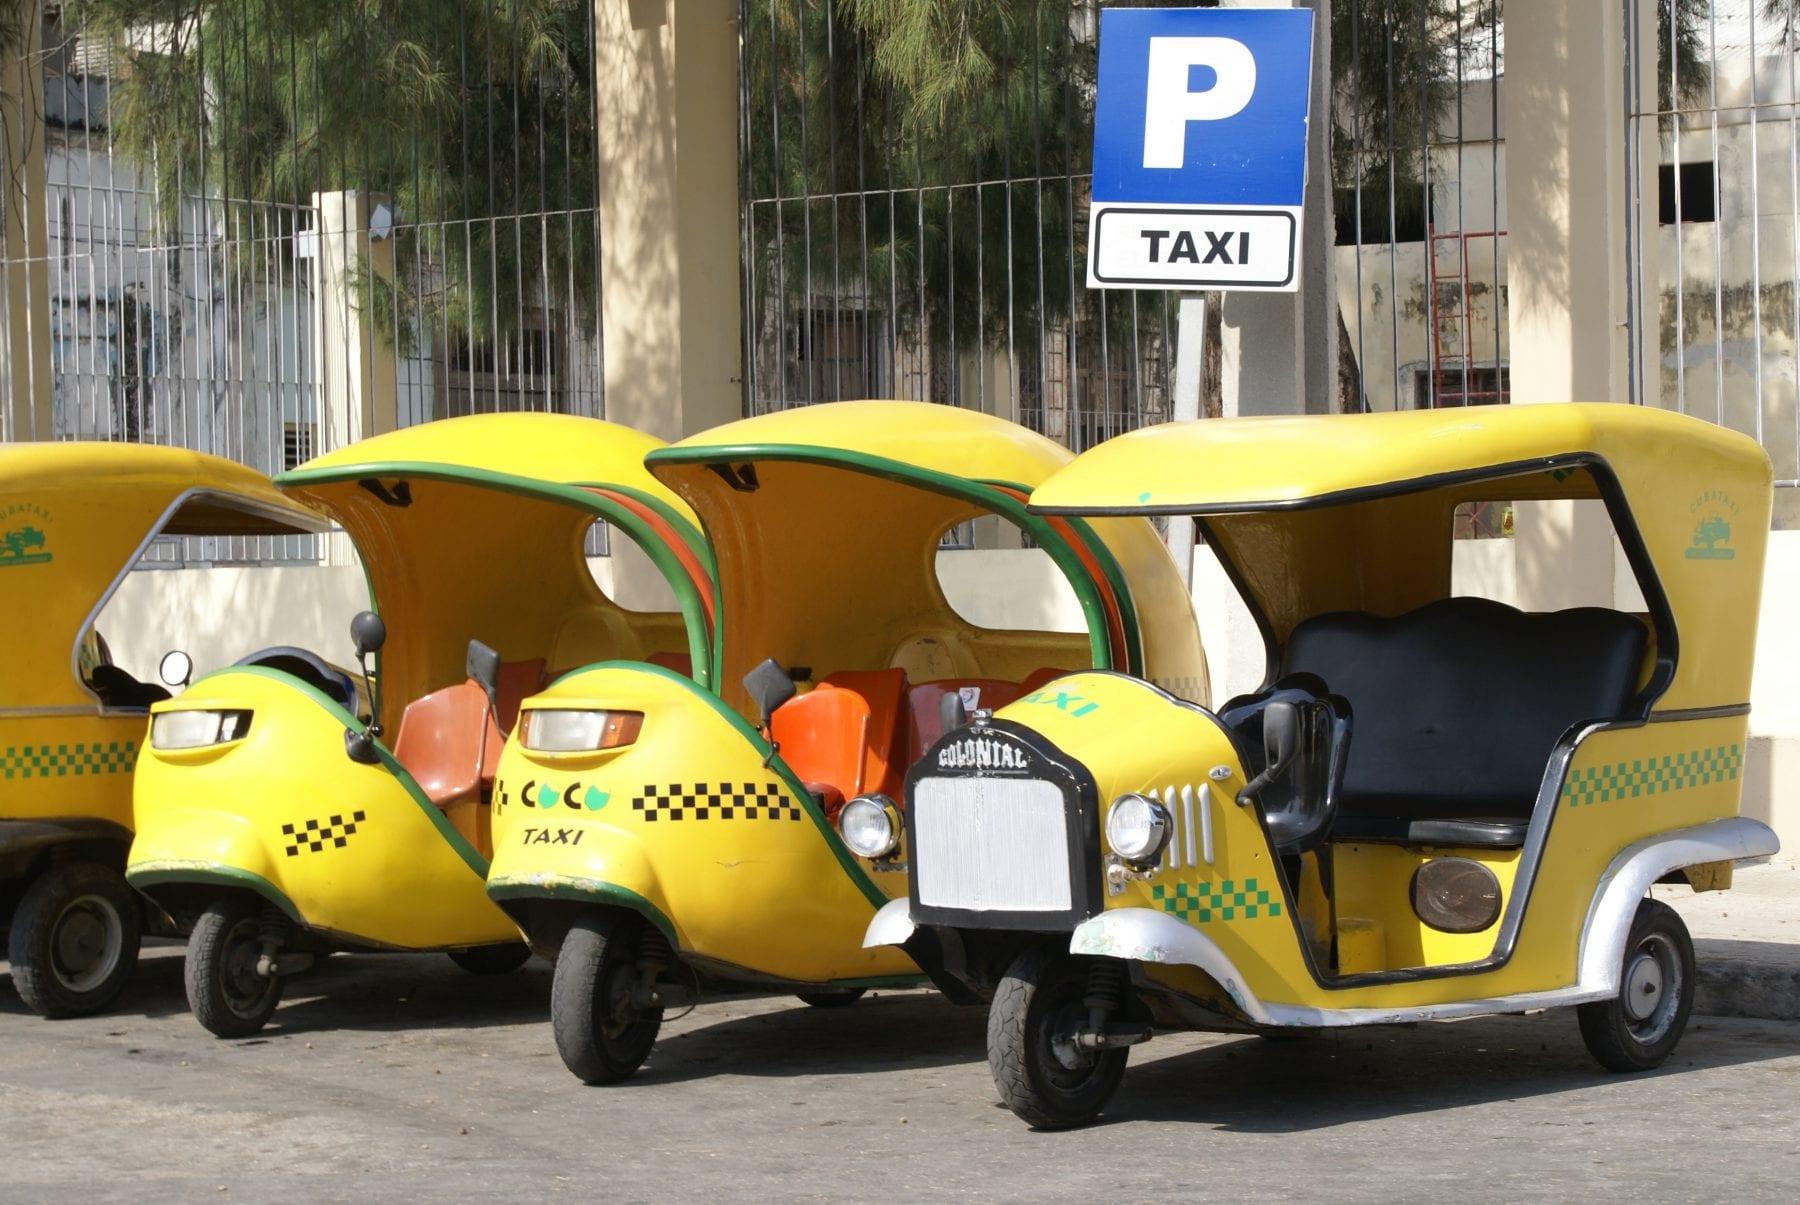 ¿Contratar un coche de alquiler barato en Cuba?